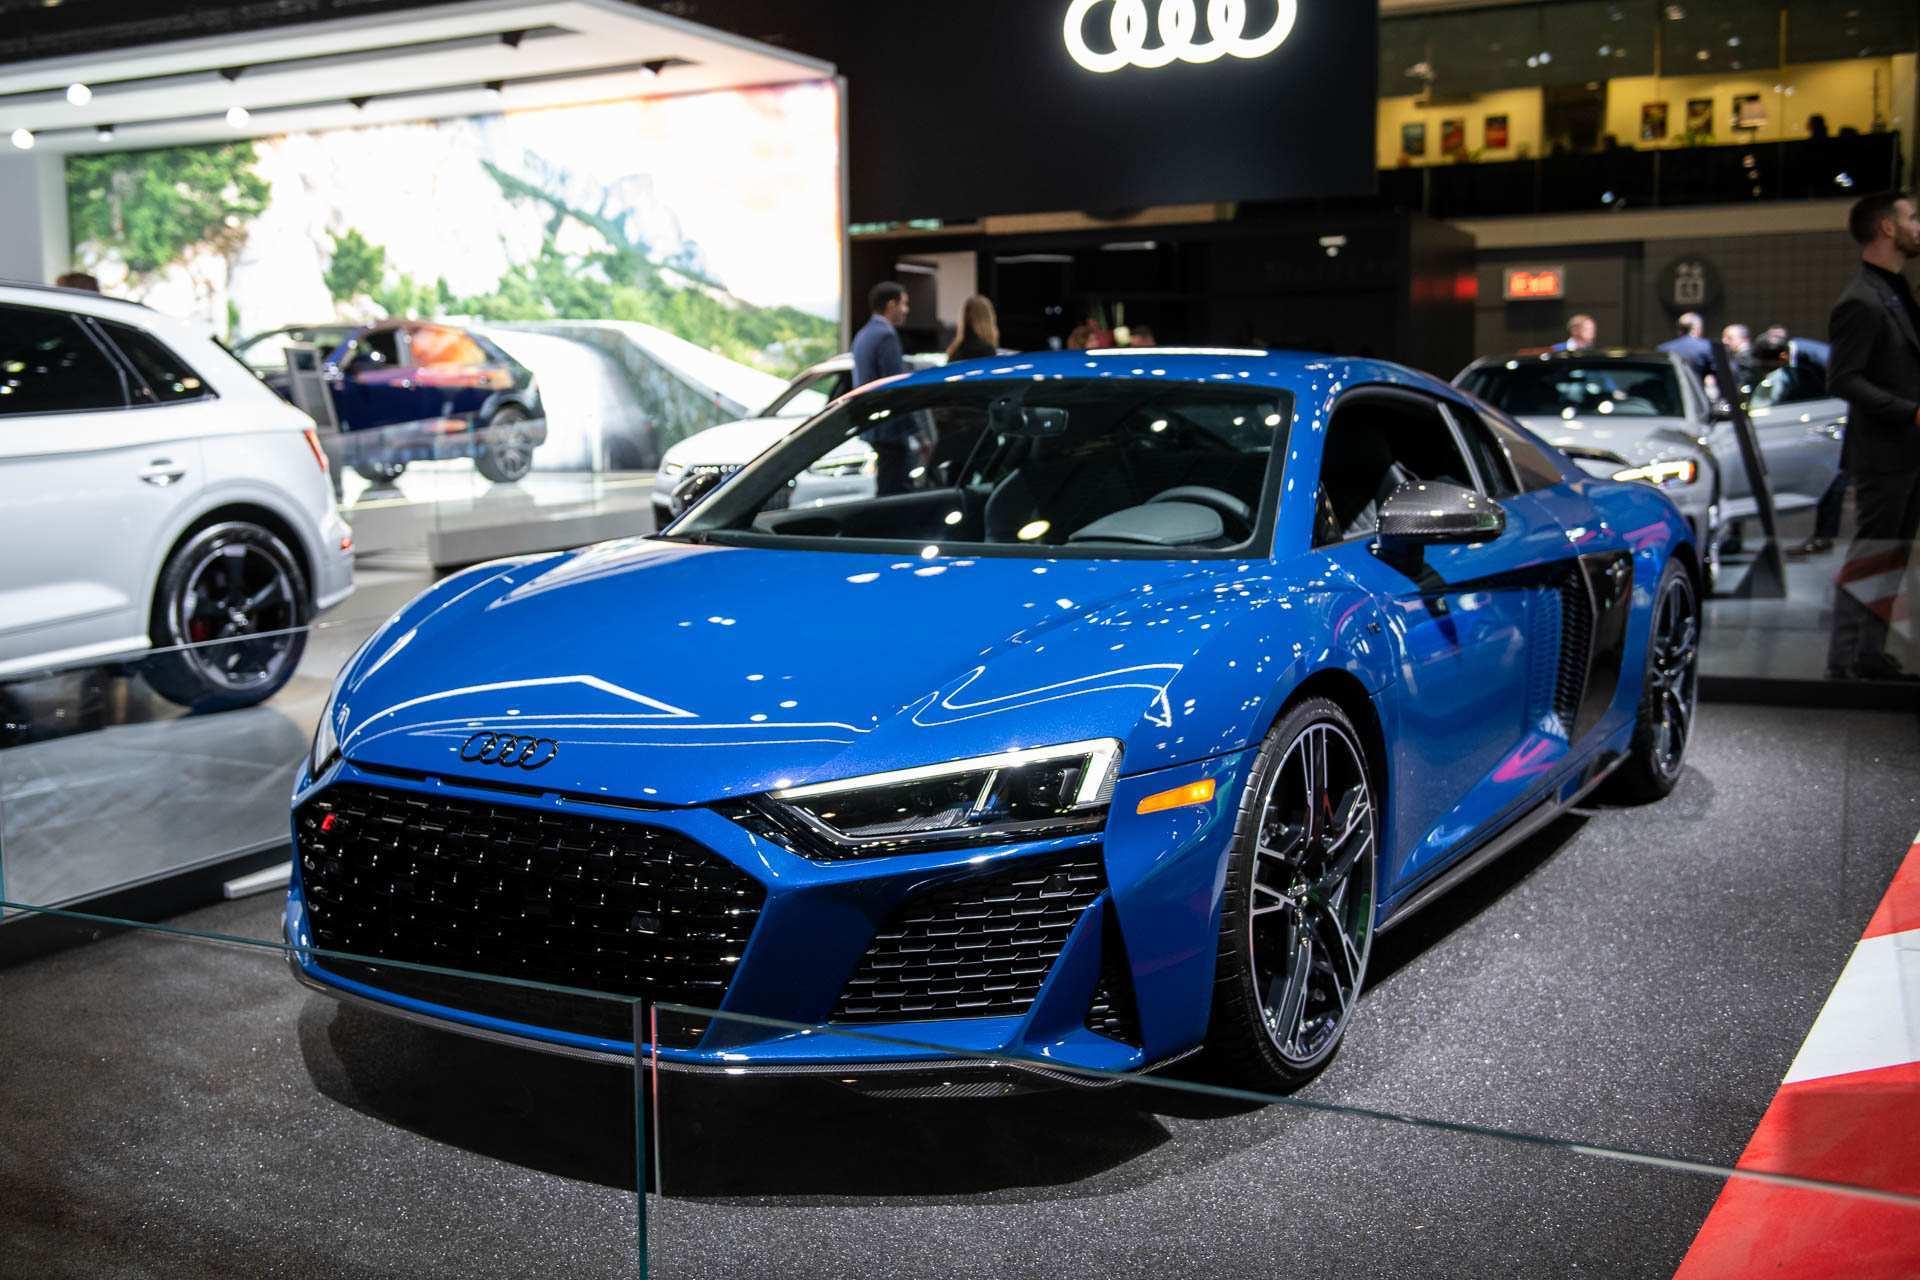 59 Concept of Audi Supercar 2020 Rumors for Audi Supercar 2020